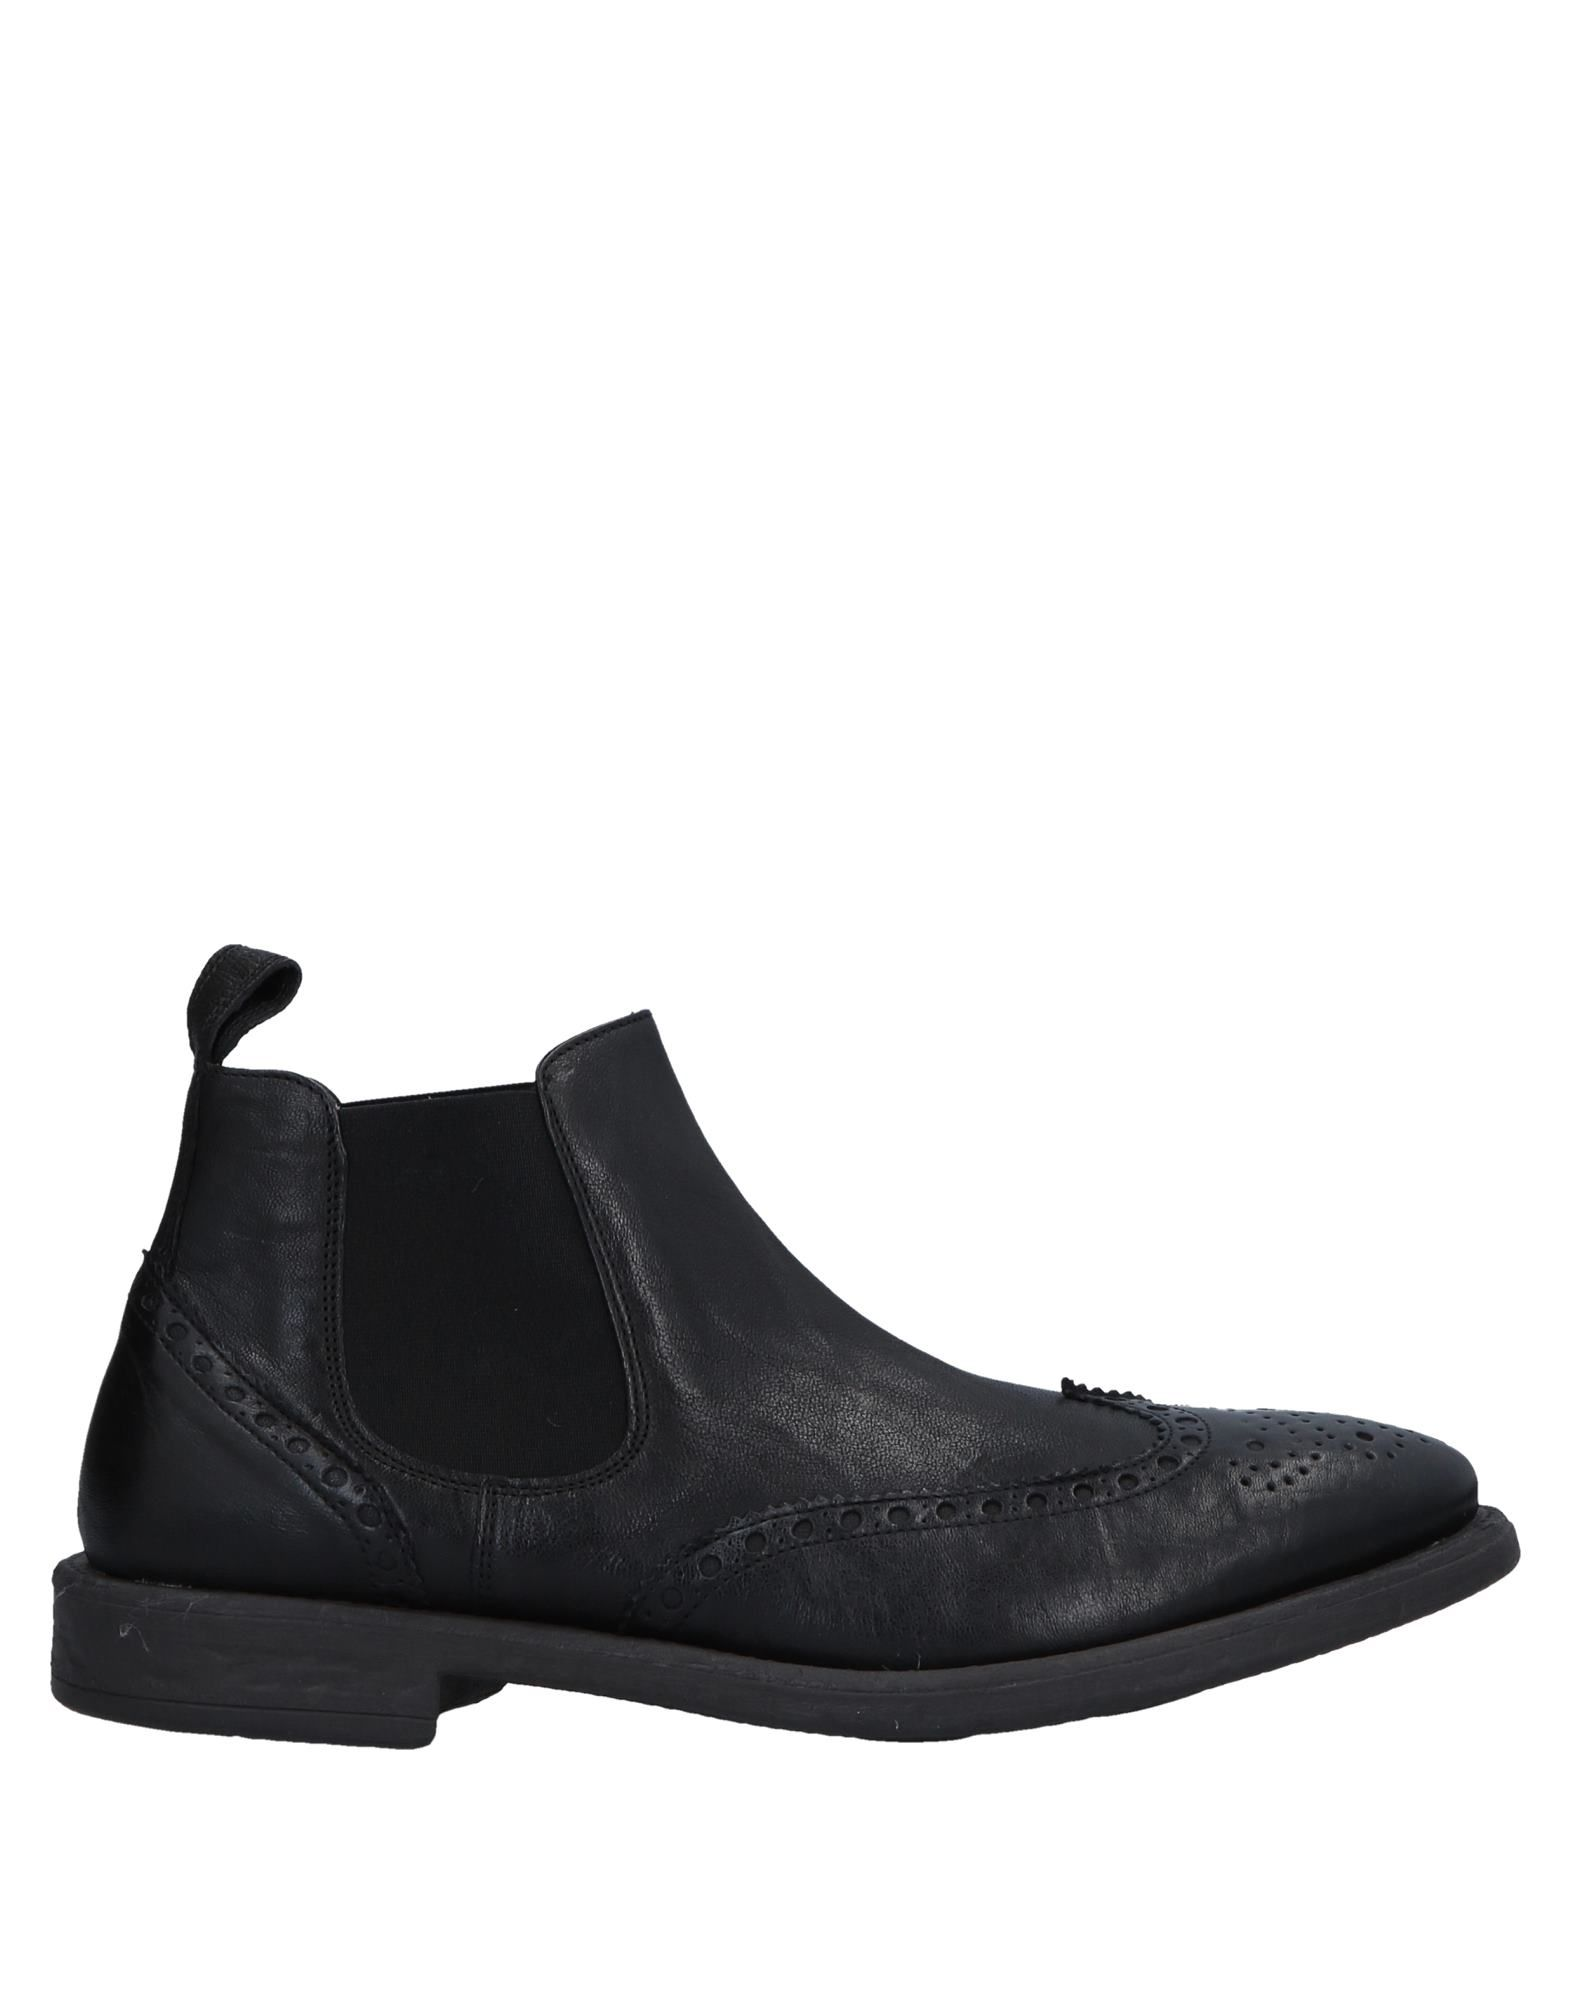 Anderson Boots online - Men Anderson Boots online Boots on  United Kingdom - 11521777XX c23213